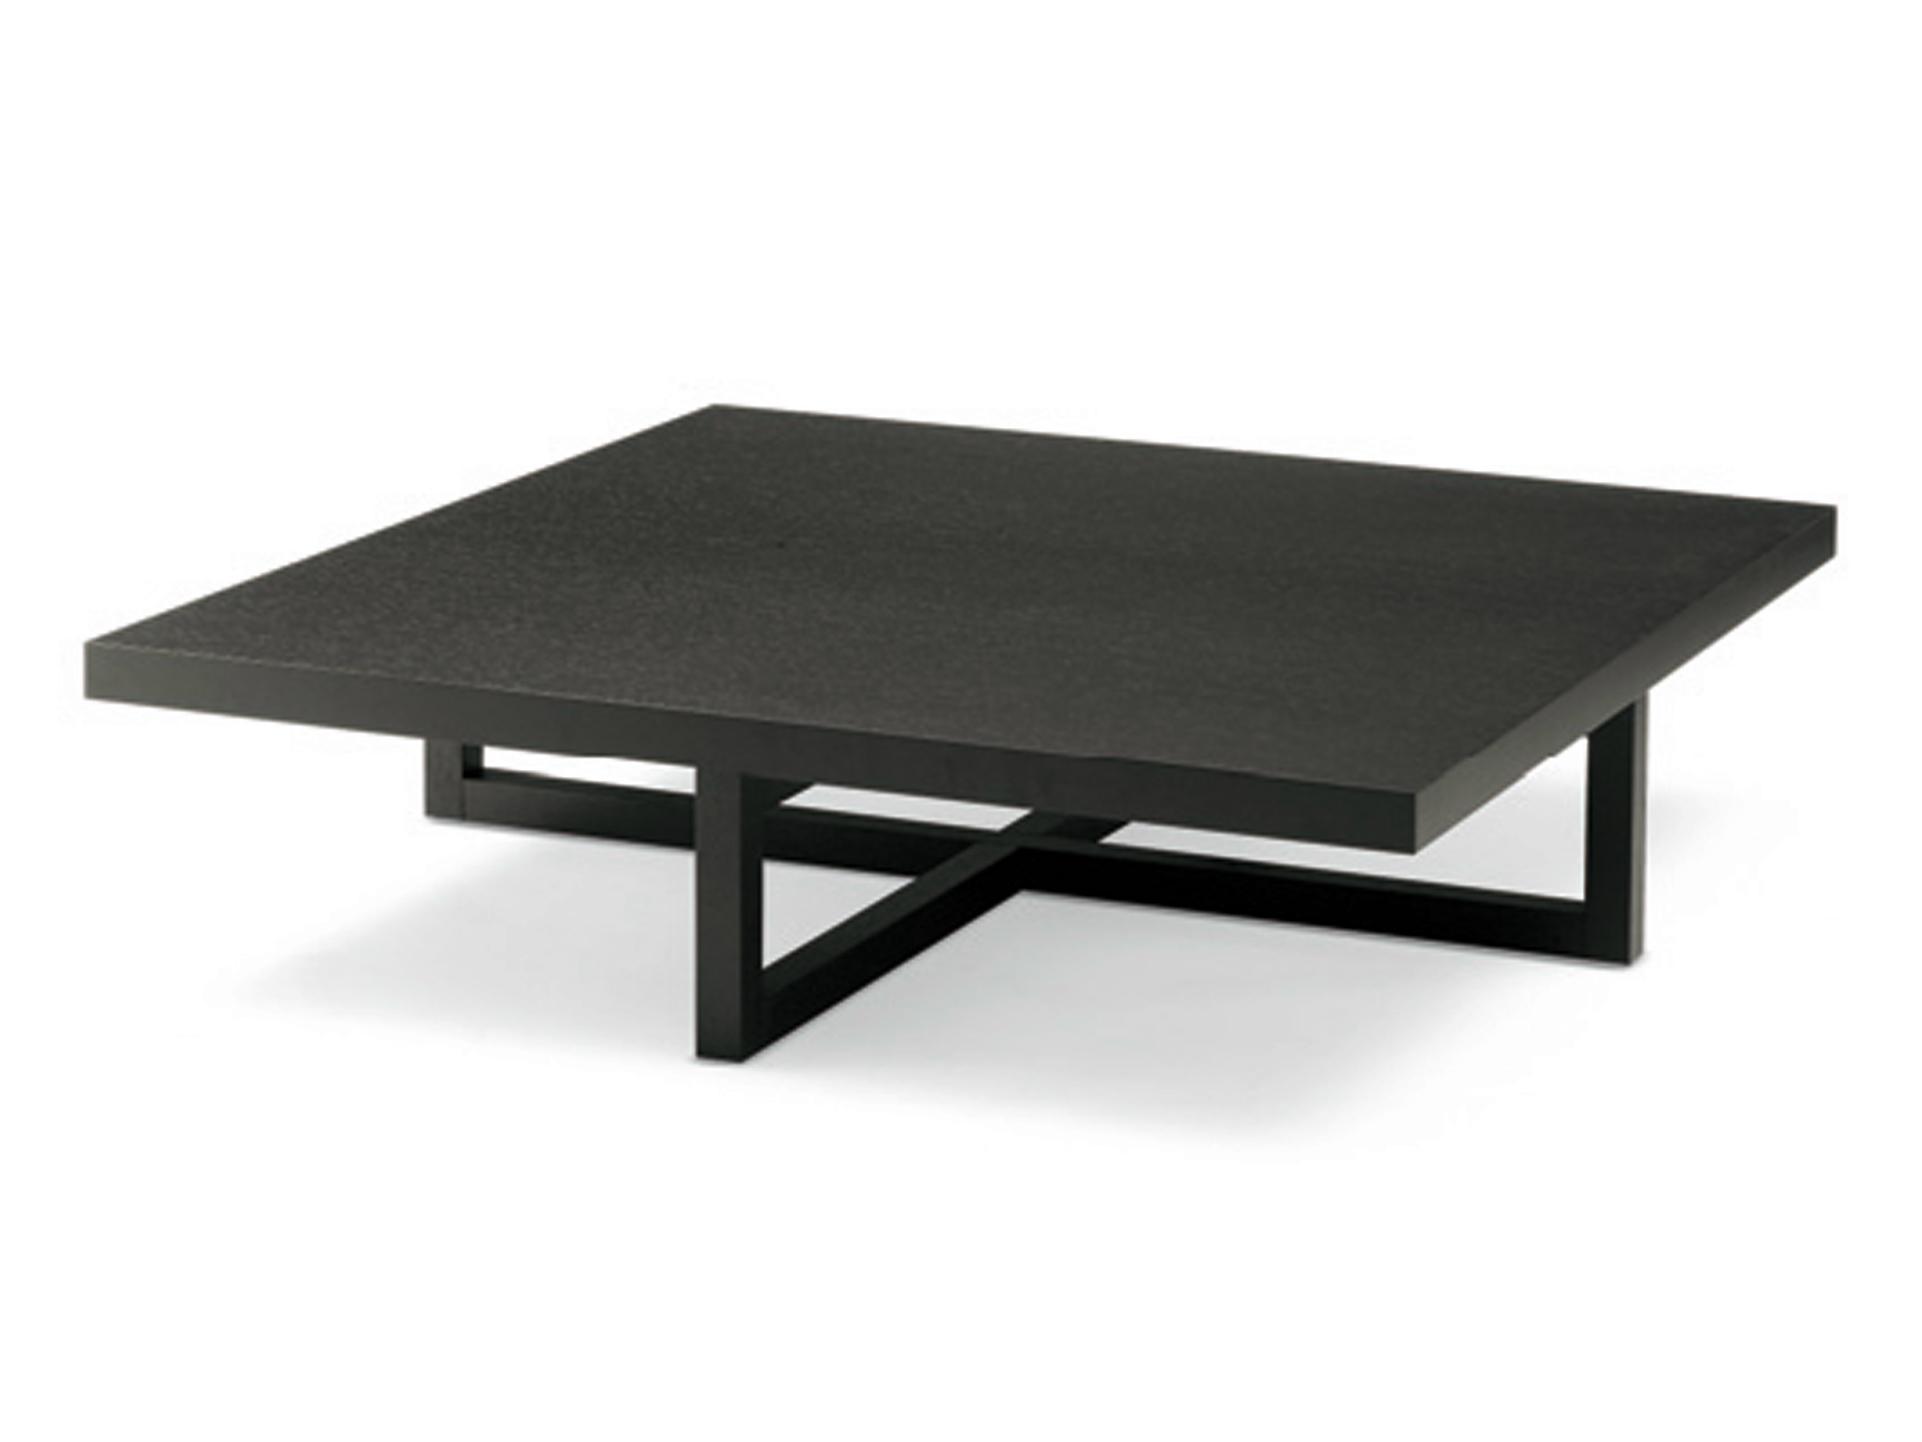 Square Contemporary Coffee Table 1